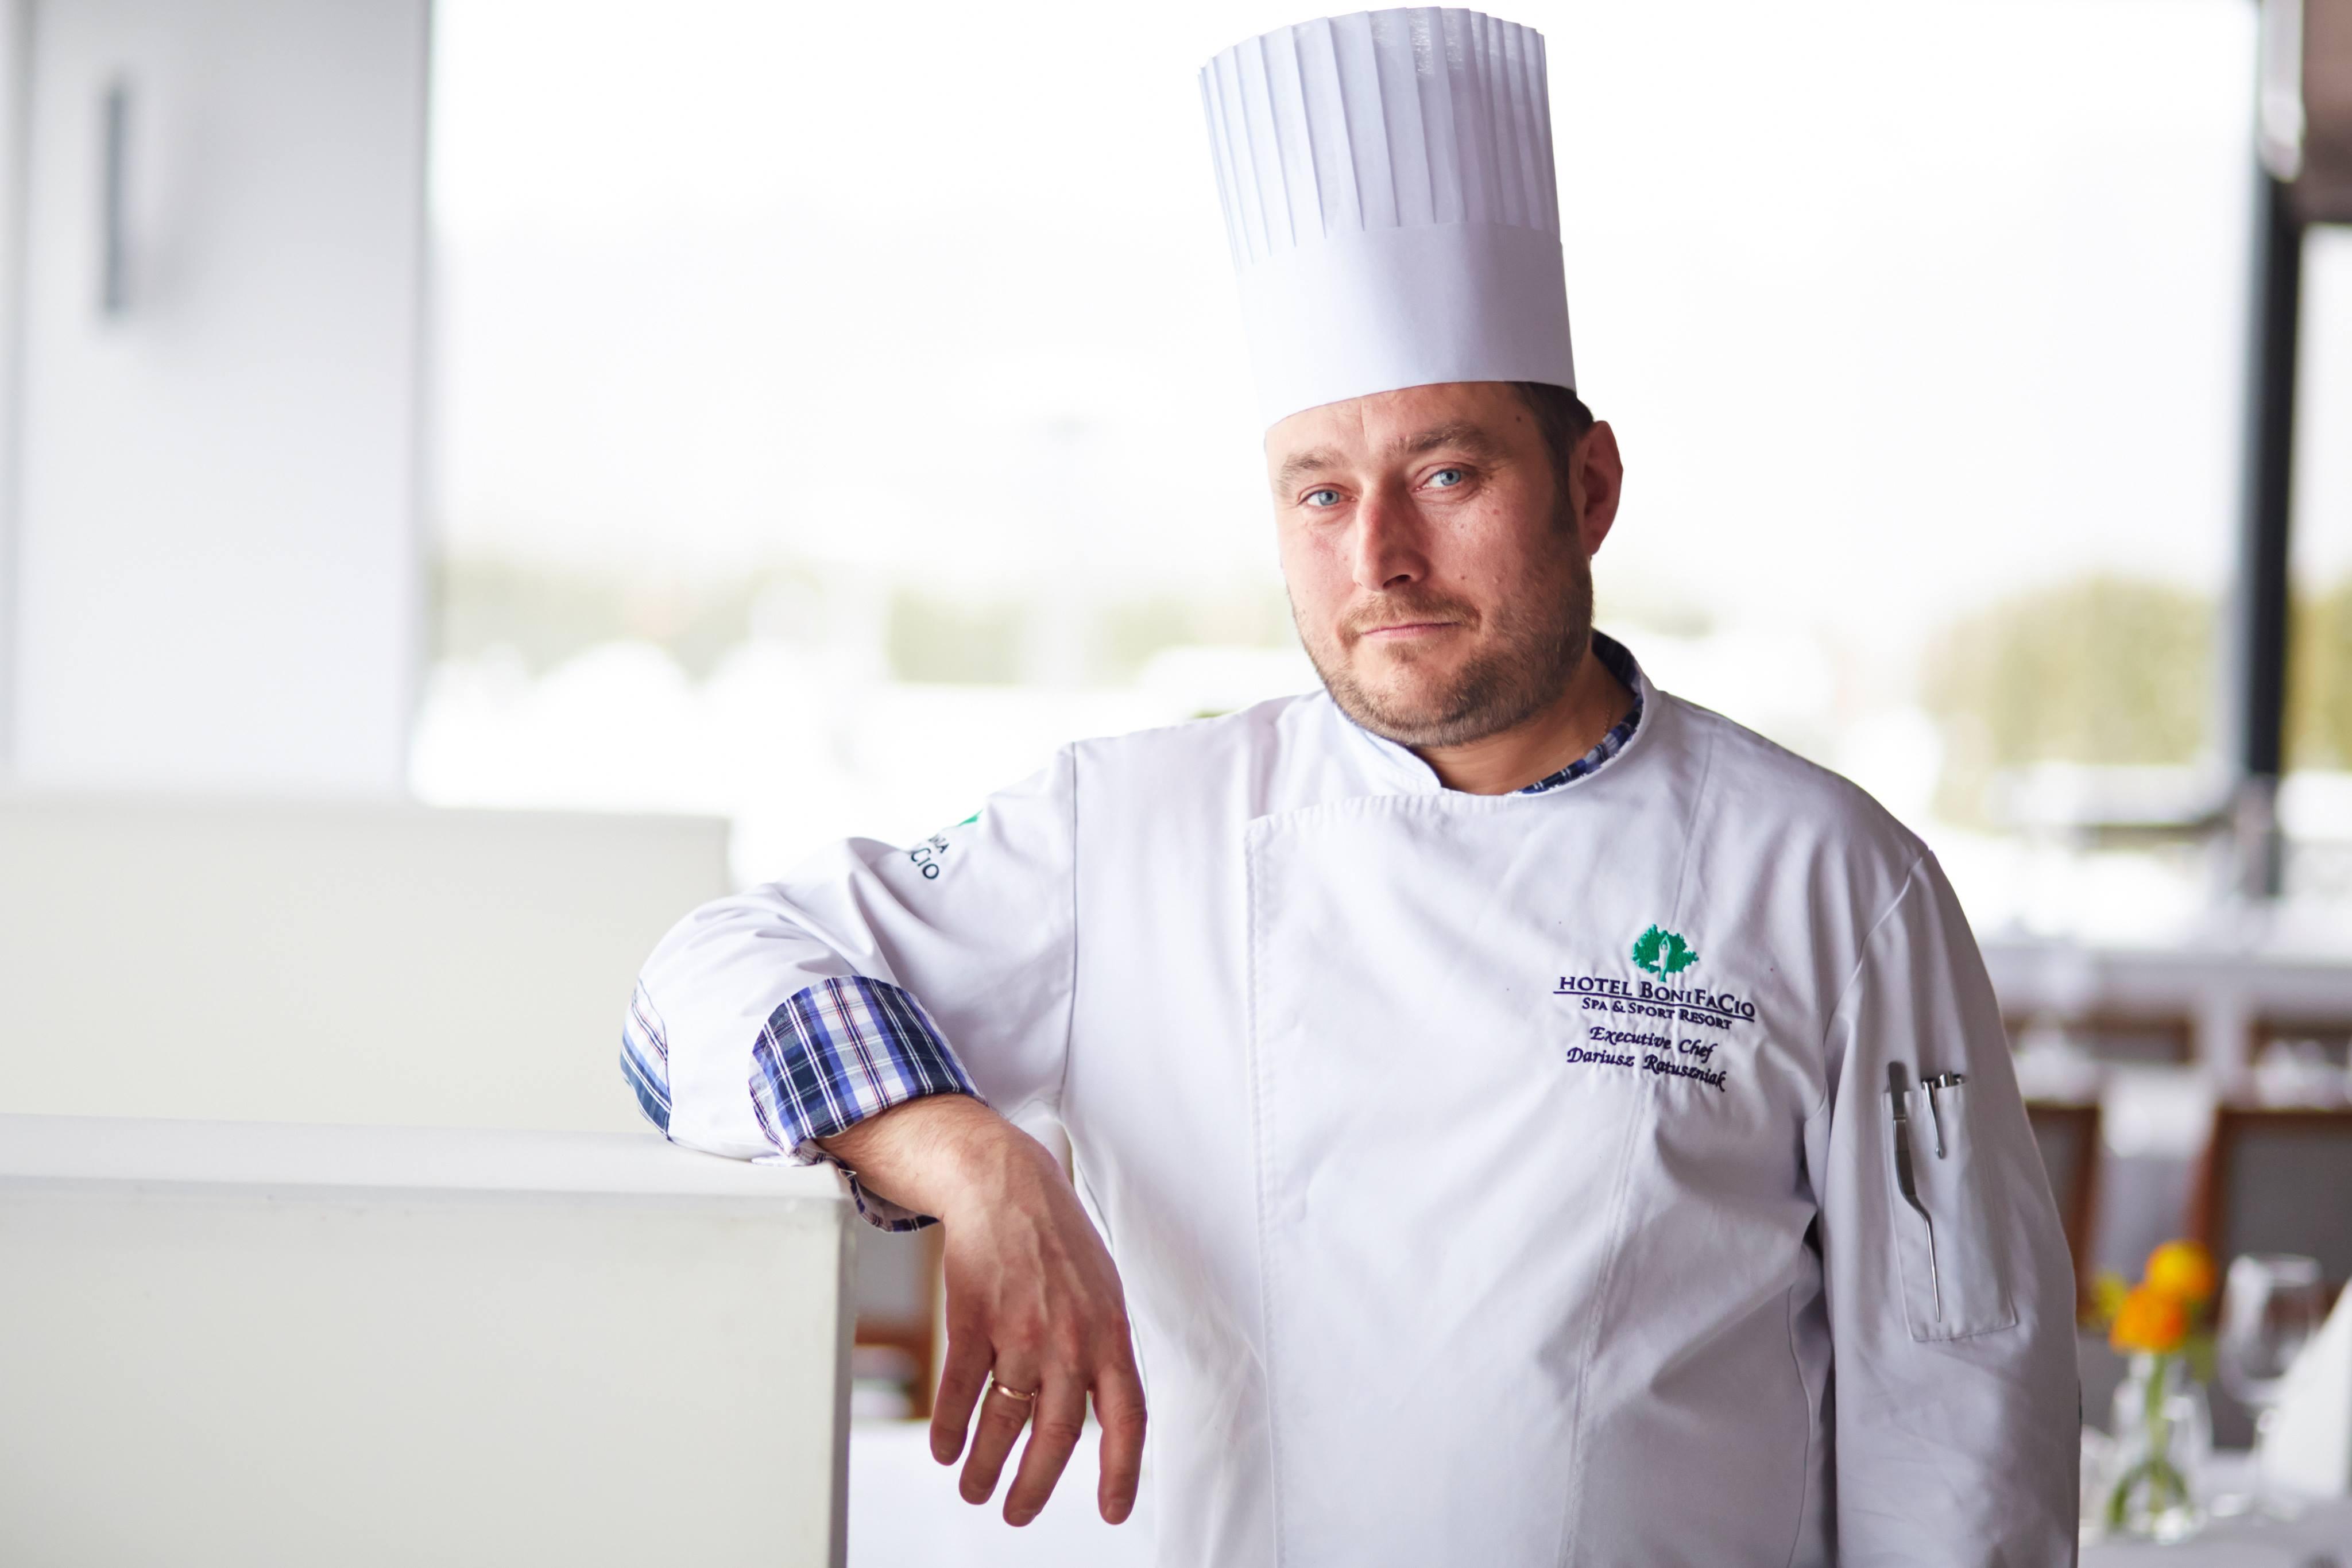 Szef Kuchni Restauracja Sztuka Gotowania Pasja Kuchnia